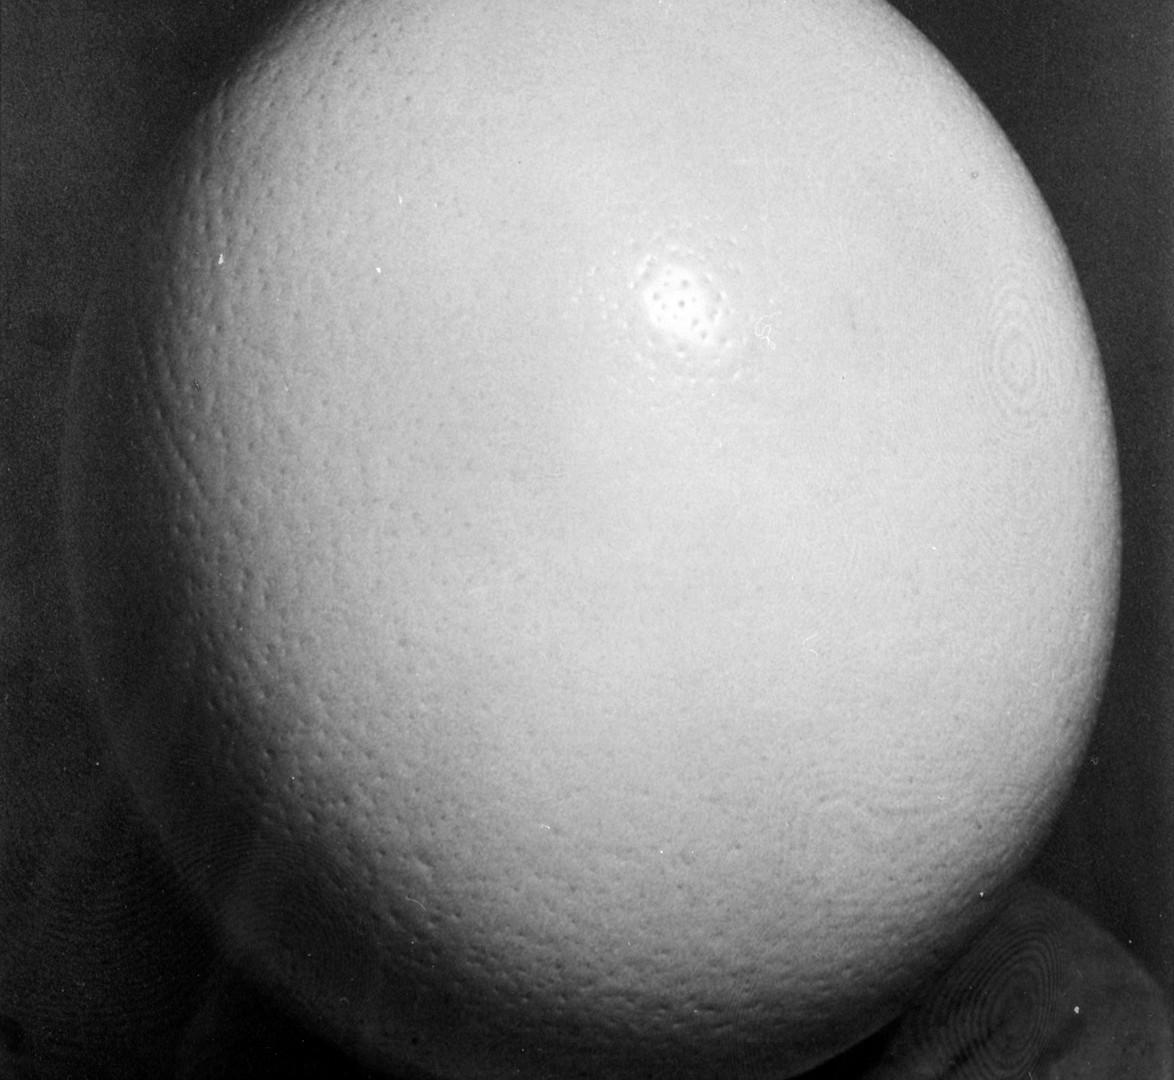 Man Ray (American, 1890-1976), Ostrich Egg, 1944